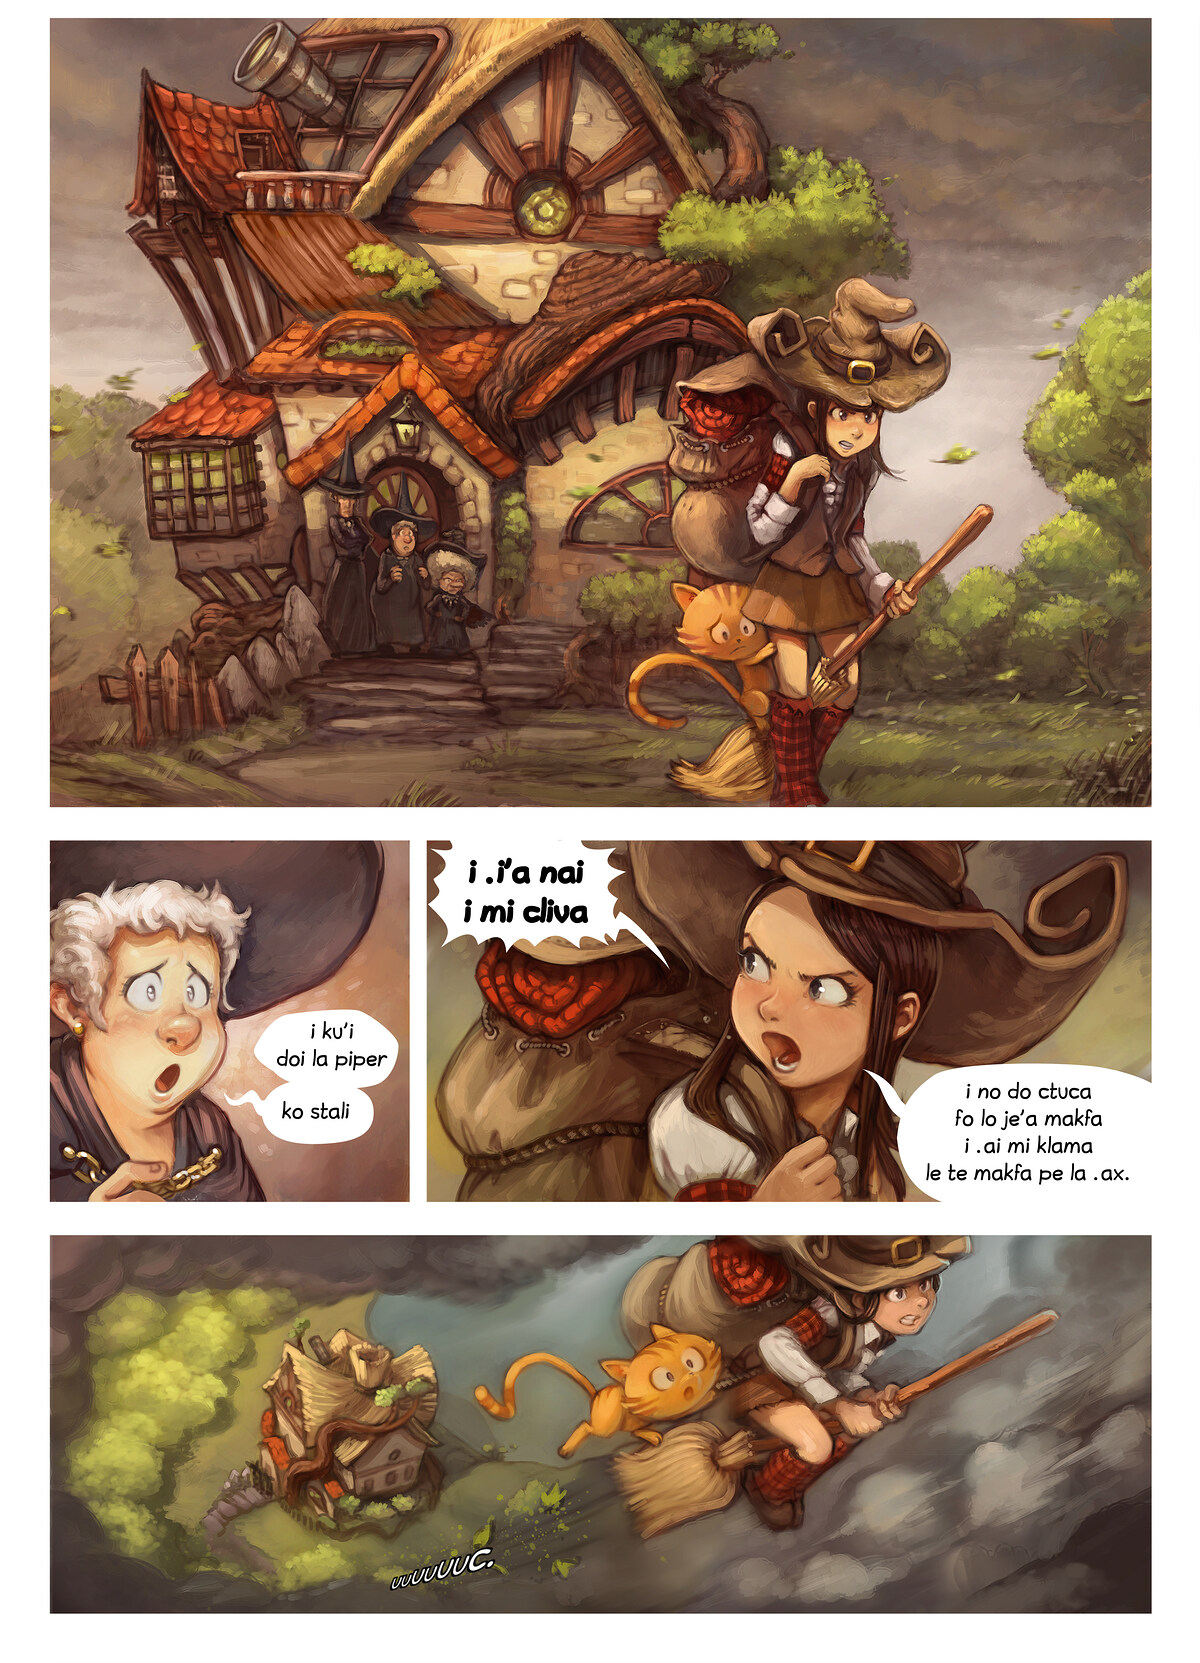 A webcomic page of Pepper&Carrot, pagbu 17 [jb], papri 1